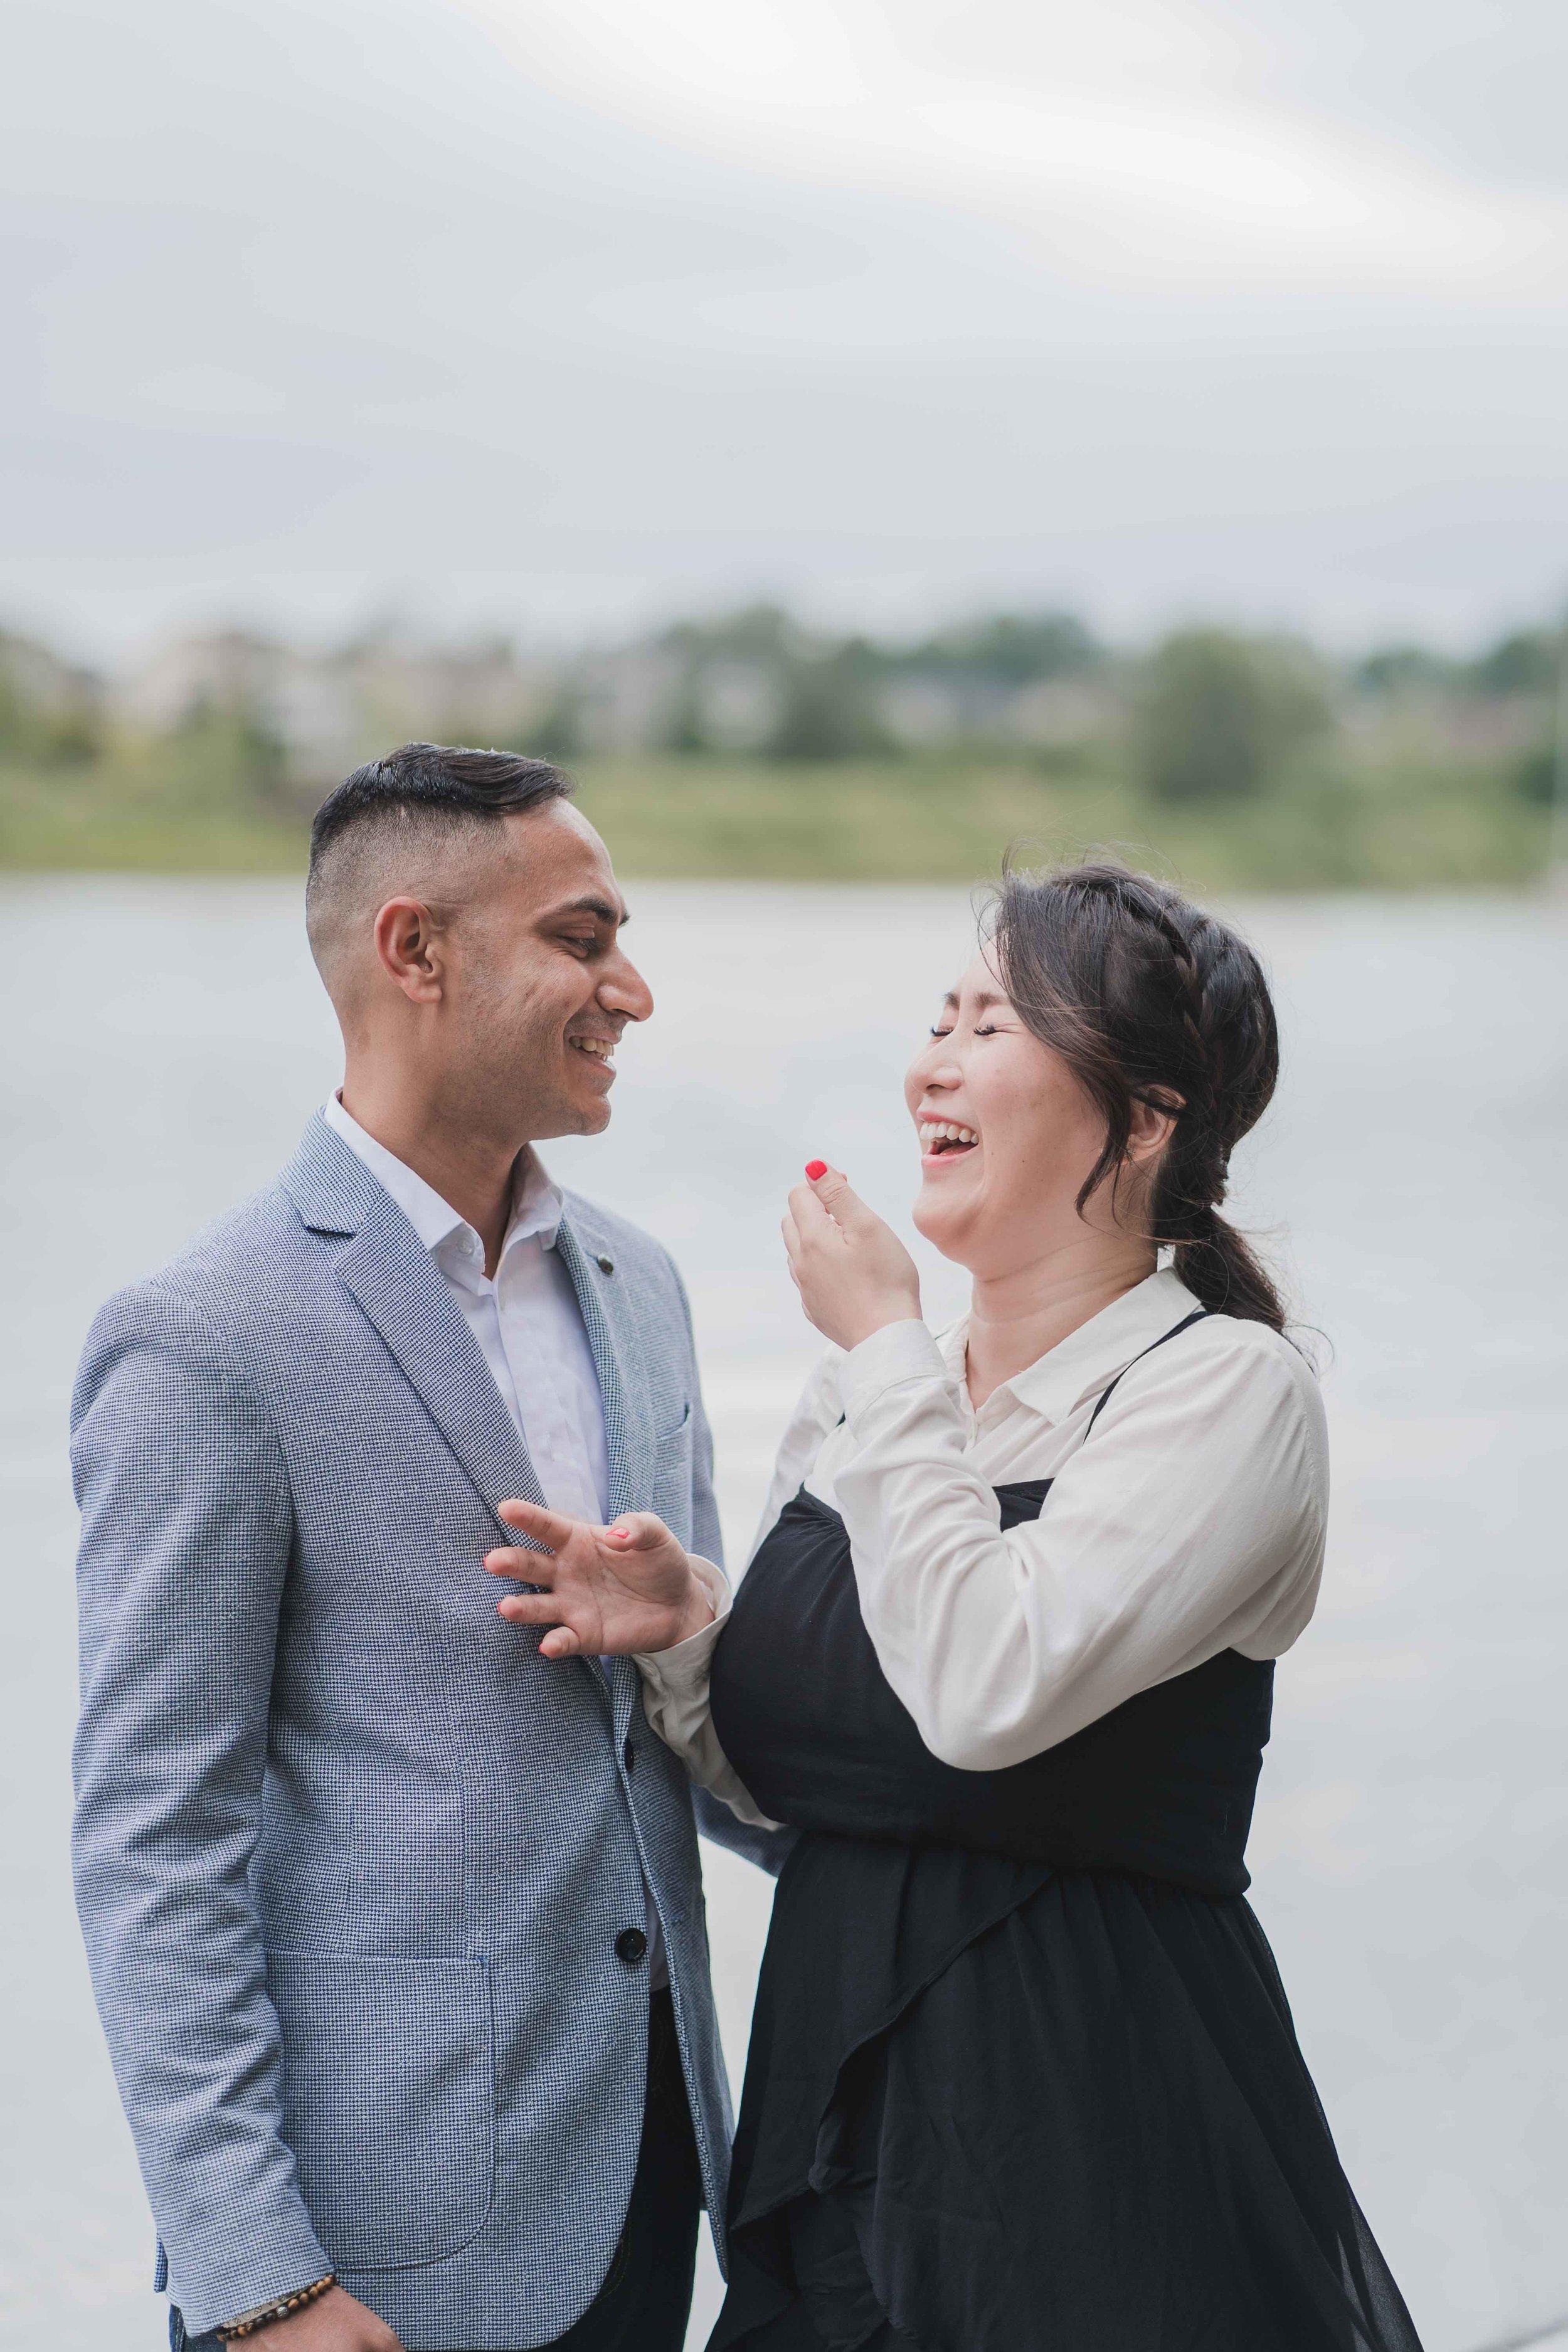 20190622 - Monika & Johnson Engagement - 0102.jpg